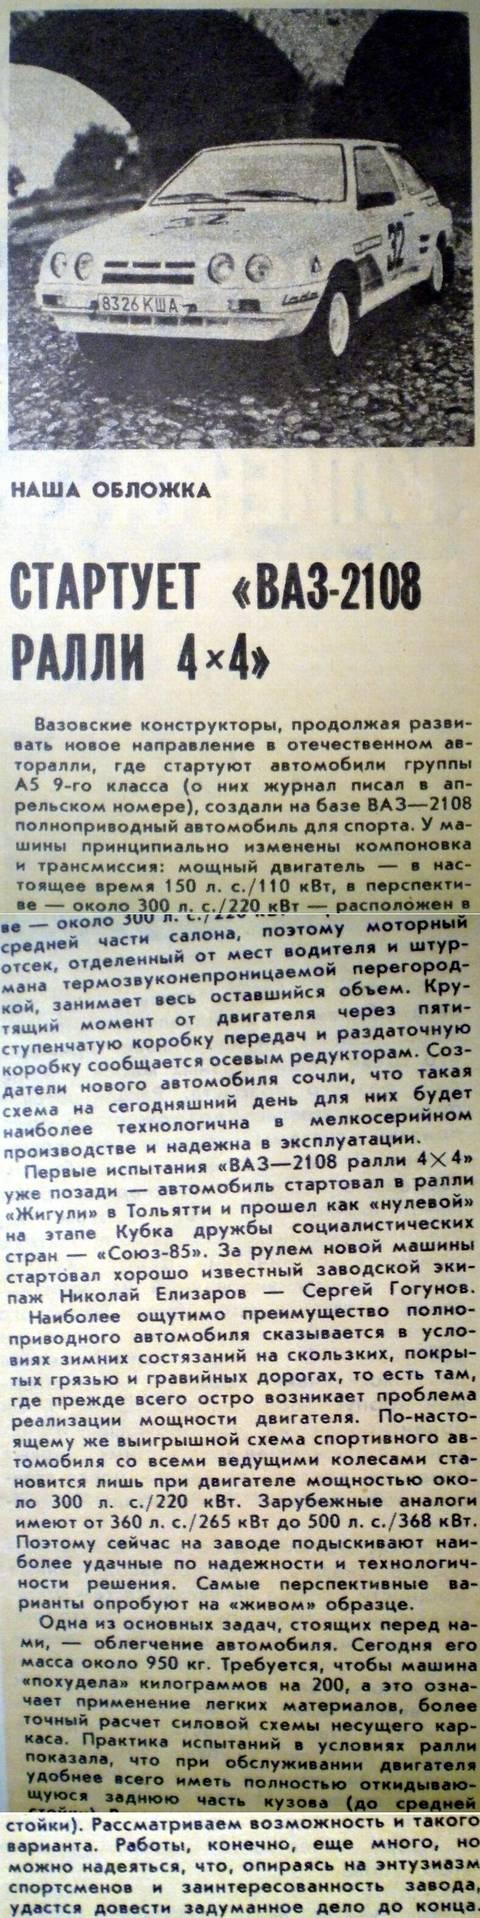 http://s1.uploads.ru/t/BRXm6.jpg